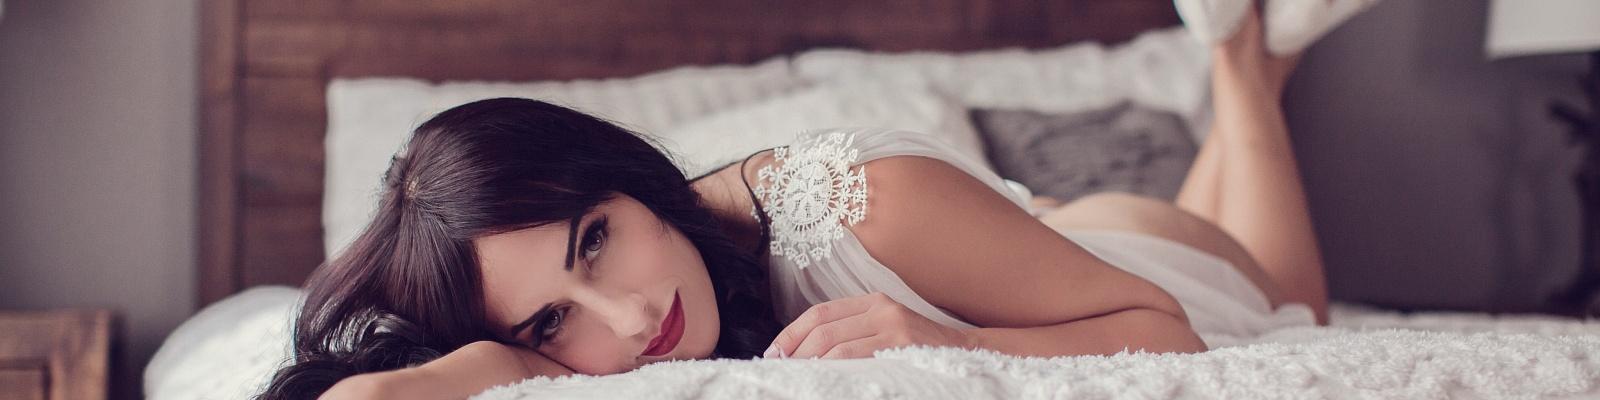 Stoya's Cover Photo